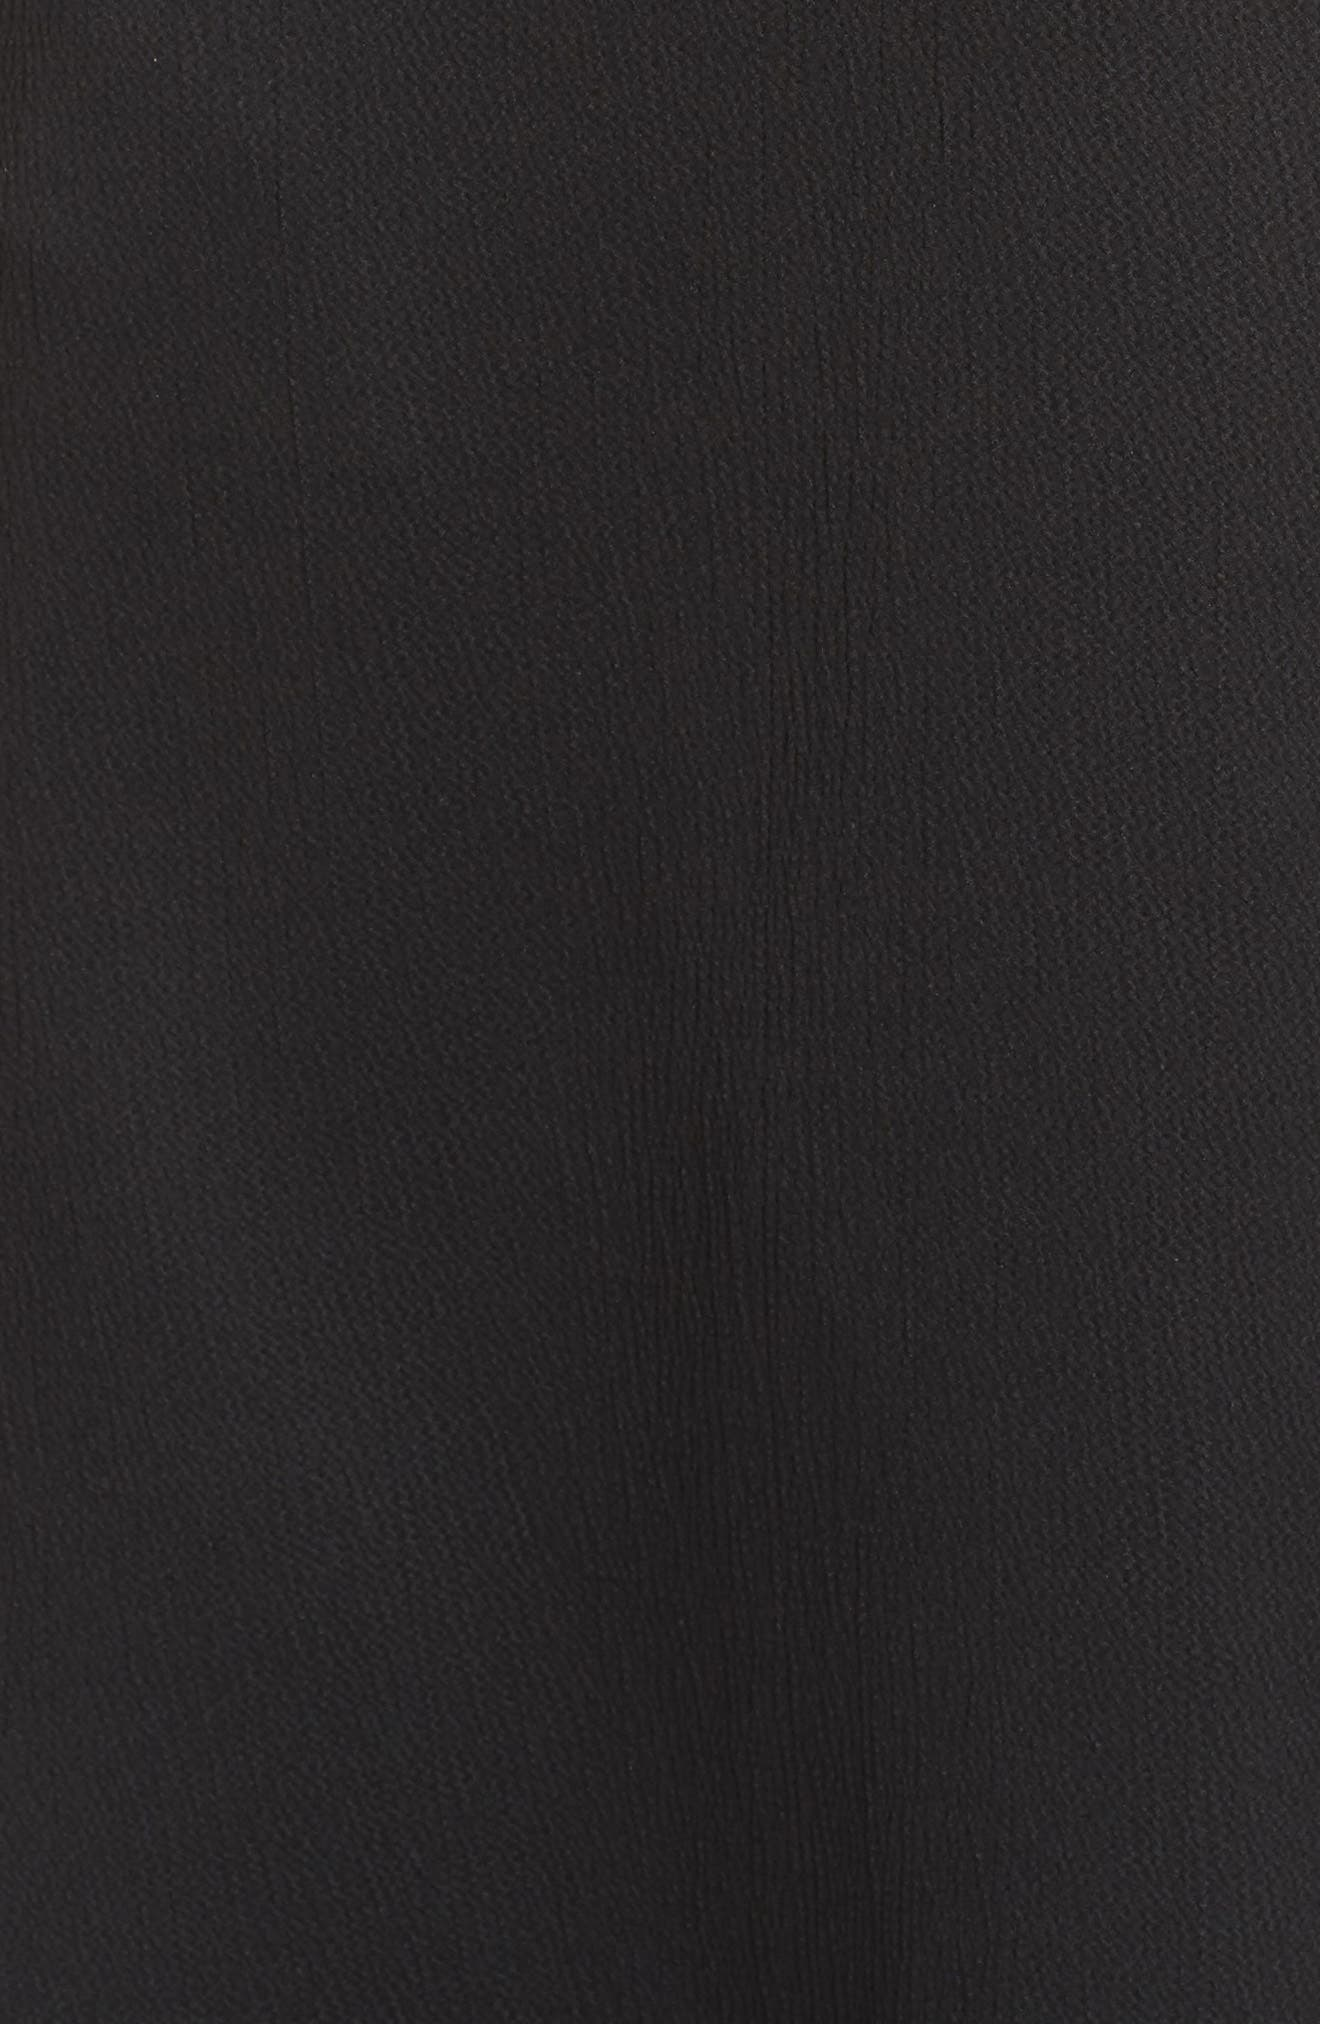 Maudie Ruffle Midi Dress,                             Alternate thumbnail 6, color,                             001